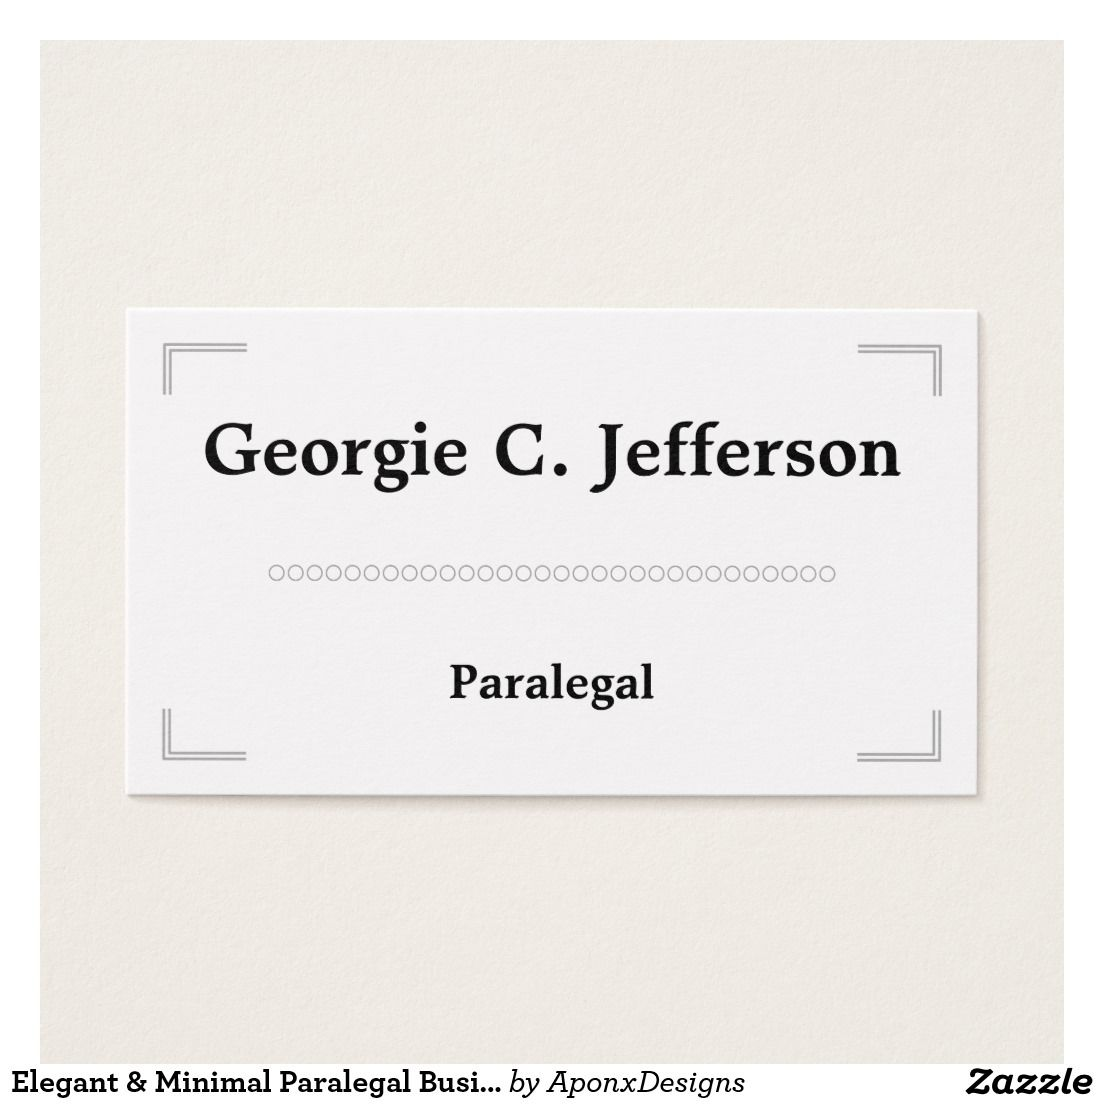 Elegant & Minimal Paralegal Business Card | Customizable Business ...